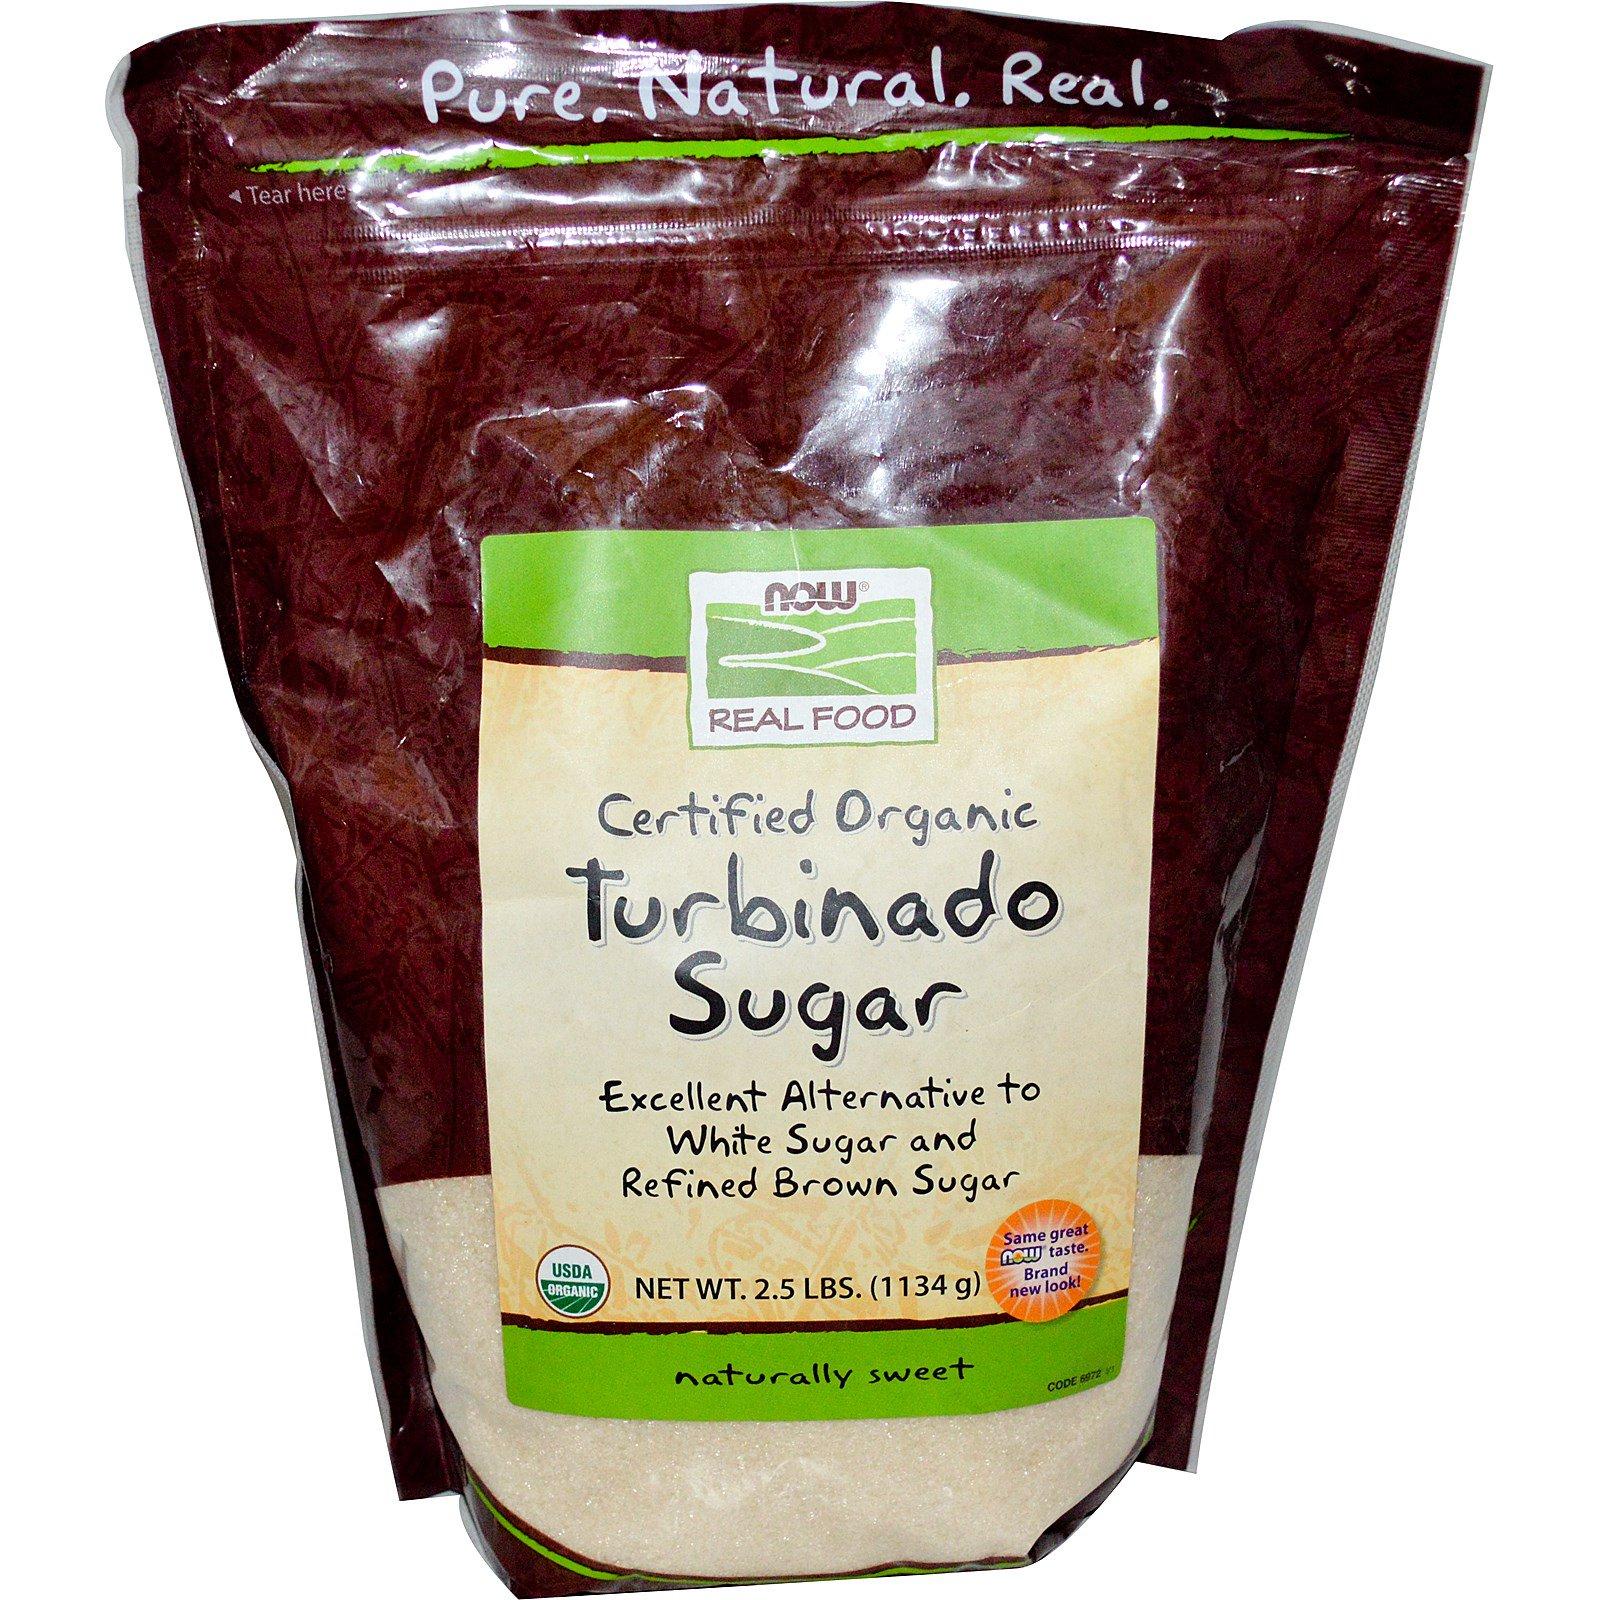 Now Foods, Real Food, Certified Organic, Turbinado Sugar, 2 5 lbs (1134 g)  (Discontinued Item)